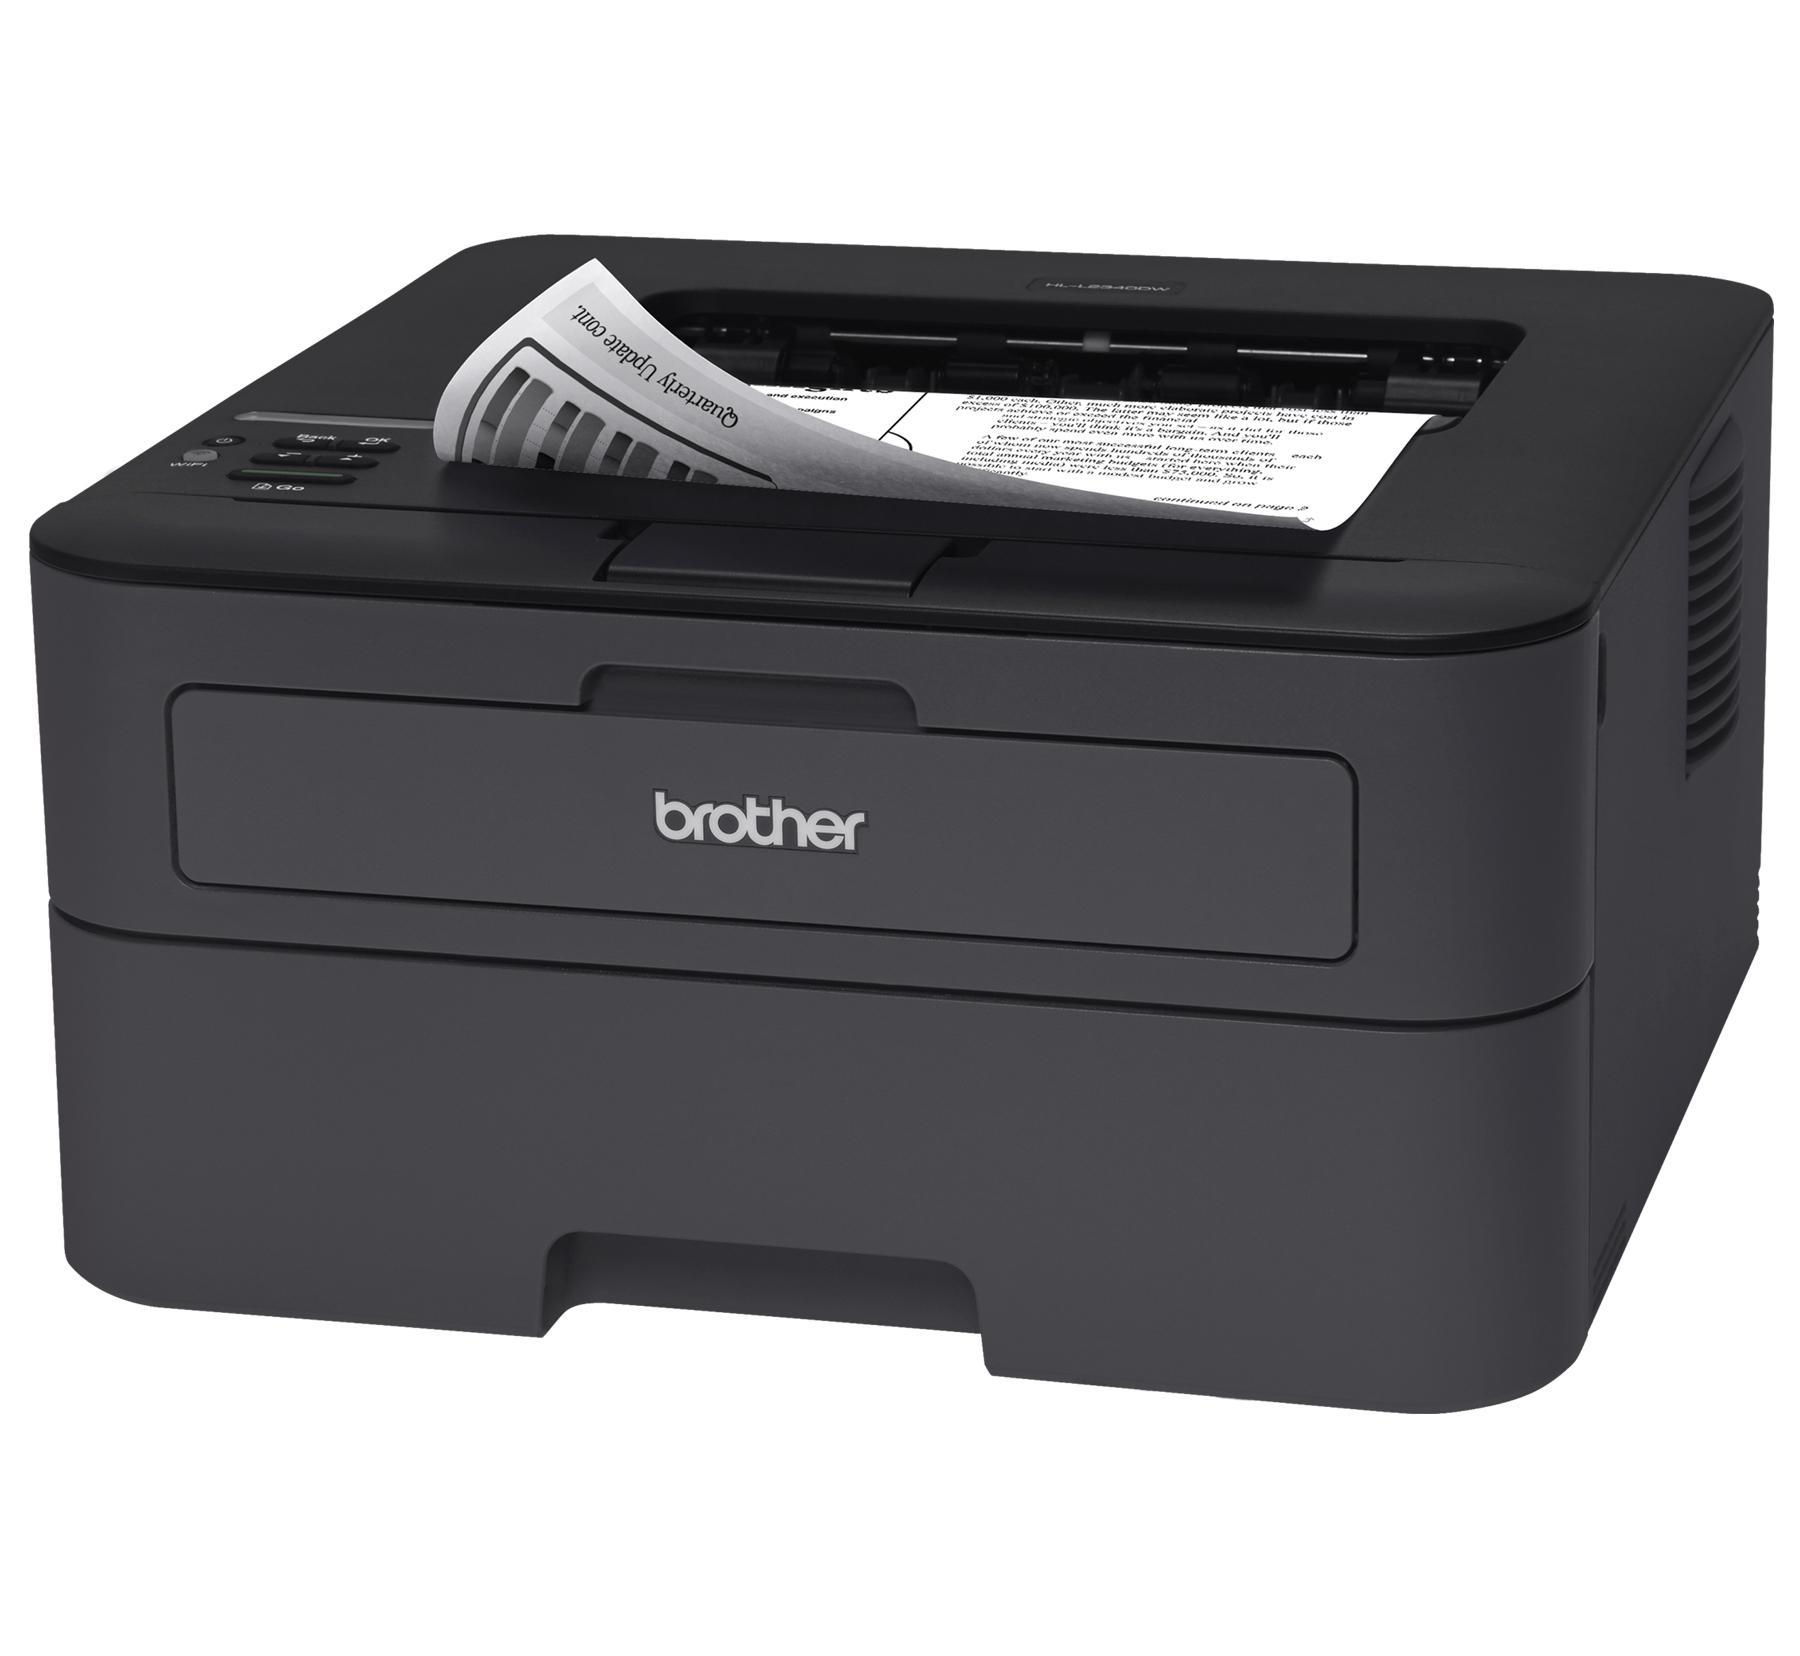 New Office Black and White Laser Printers HP LaserJet Pro 400 ...